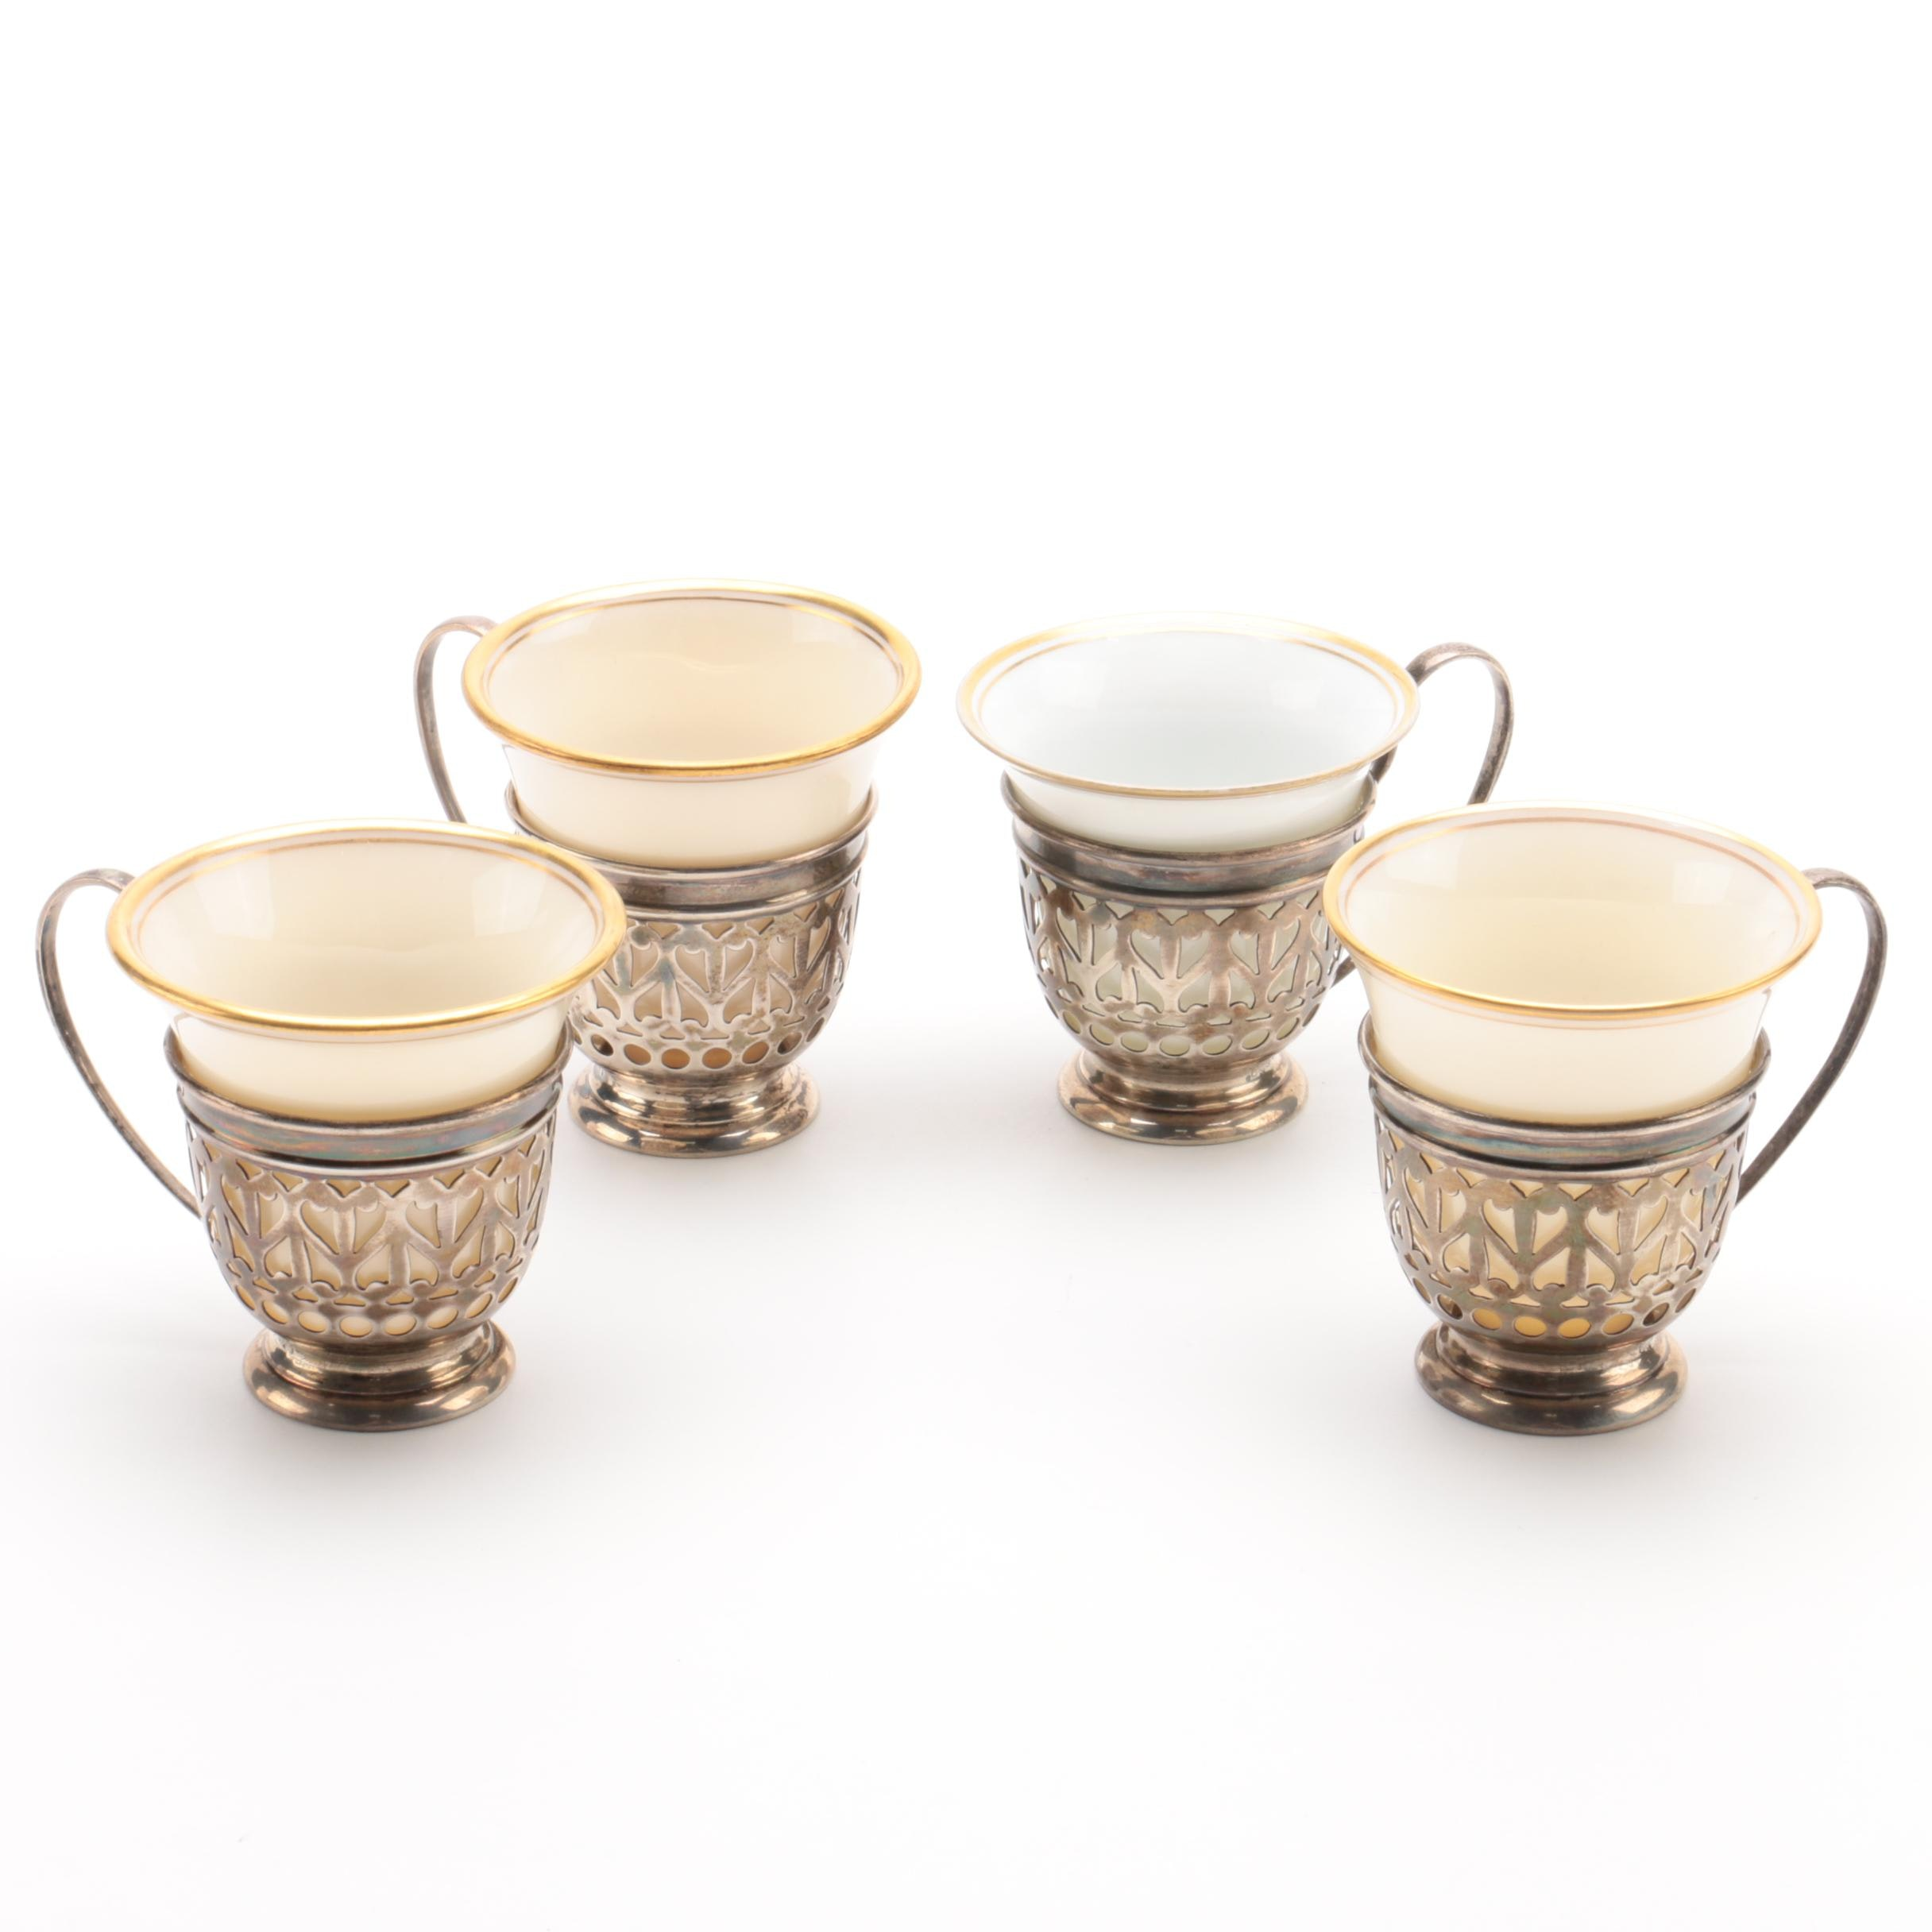 Lenox Porcelain Demitasse Cups with Gorham Sterling Silver Mounts